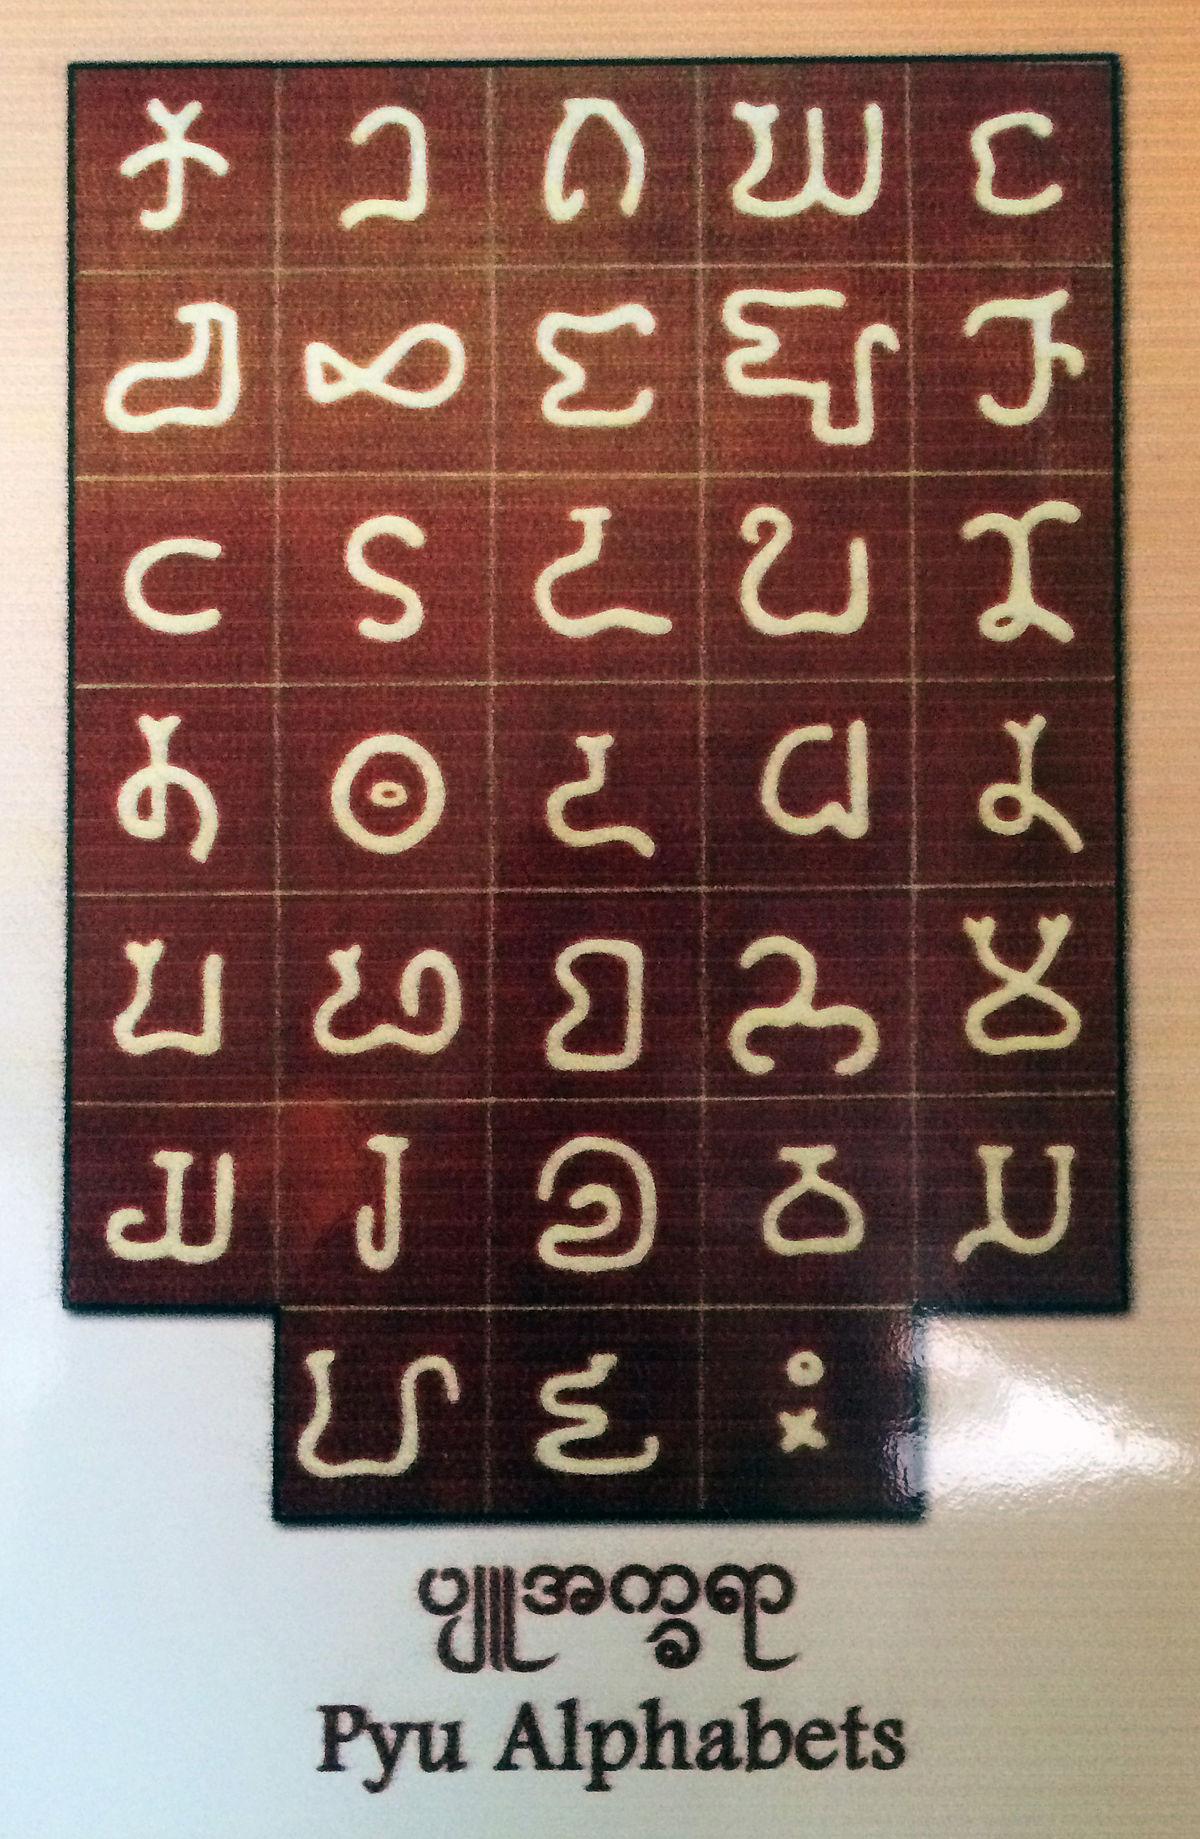 Httpwww Overlordsofchaos Comhtmlorigin Of The Word Jew Html: Pyu Language (Burma)